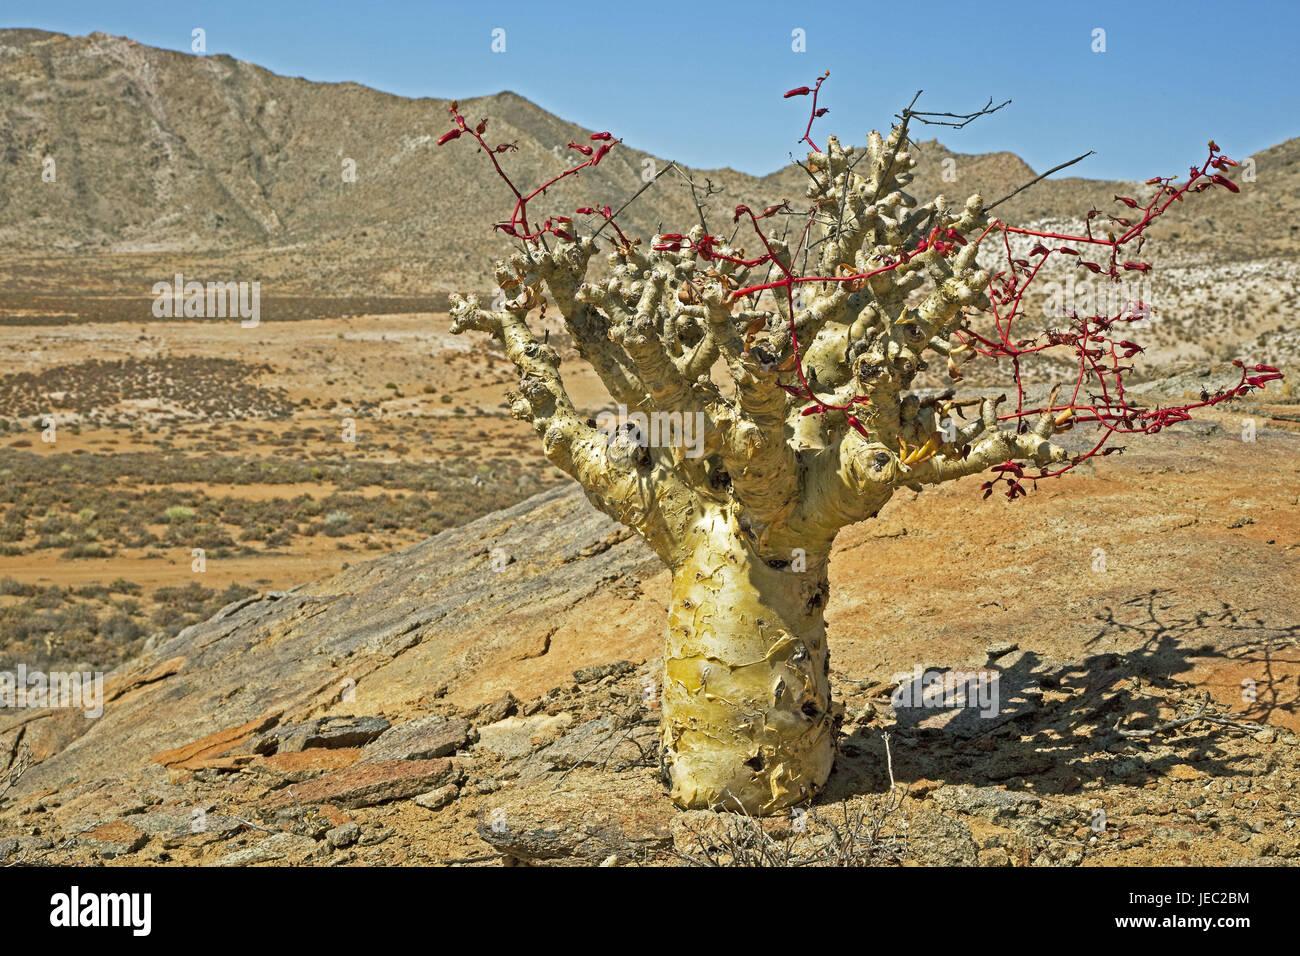 South Africa, Namaqualand, succulent, Botterboom, Tylecodon paniculatus, scenery, mountain landscape, desert, coastal - Stock Image